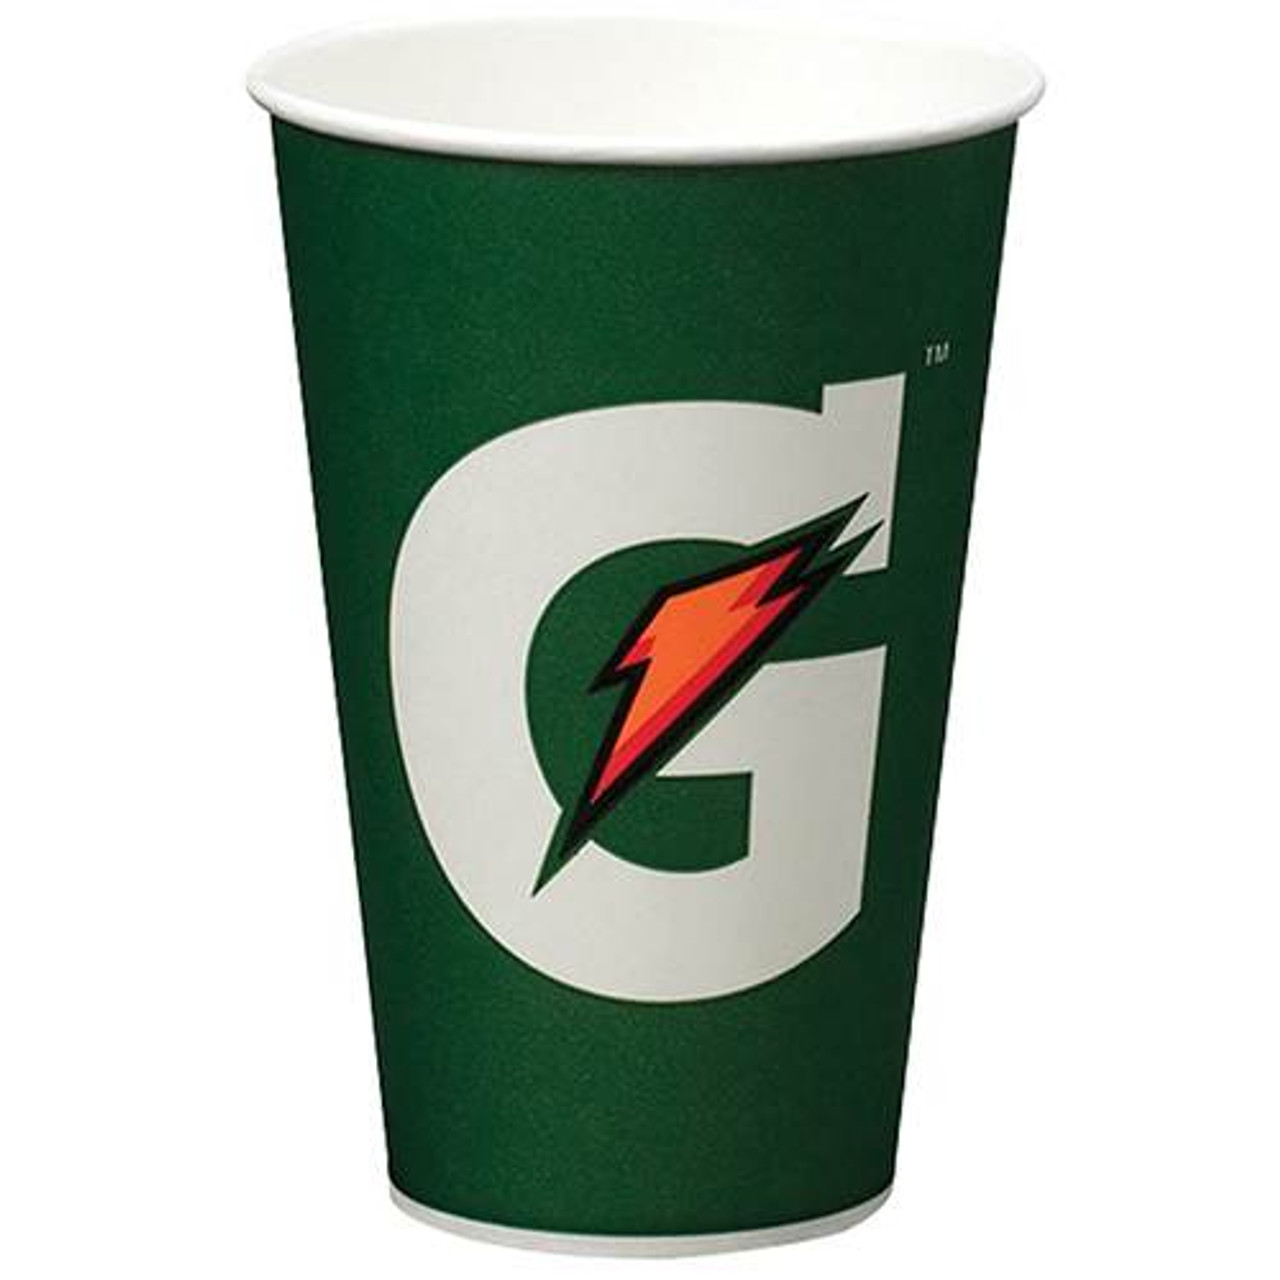 Gatorade 7 oz. Disposable Cups (2,000-Pack)